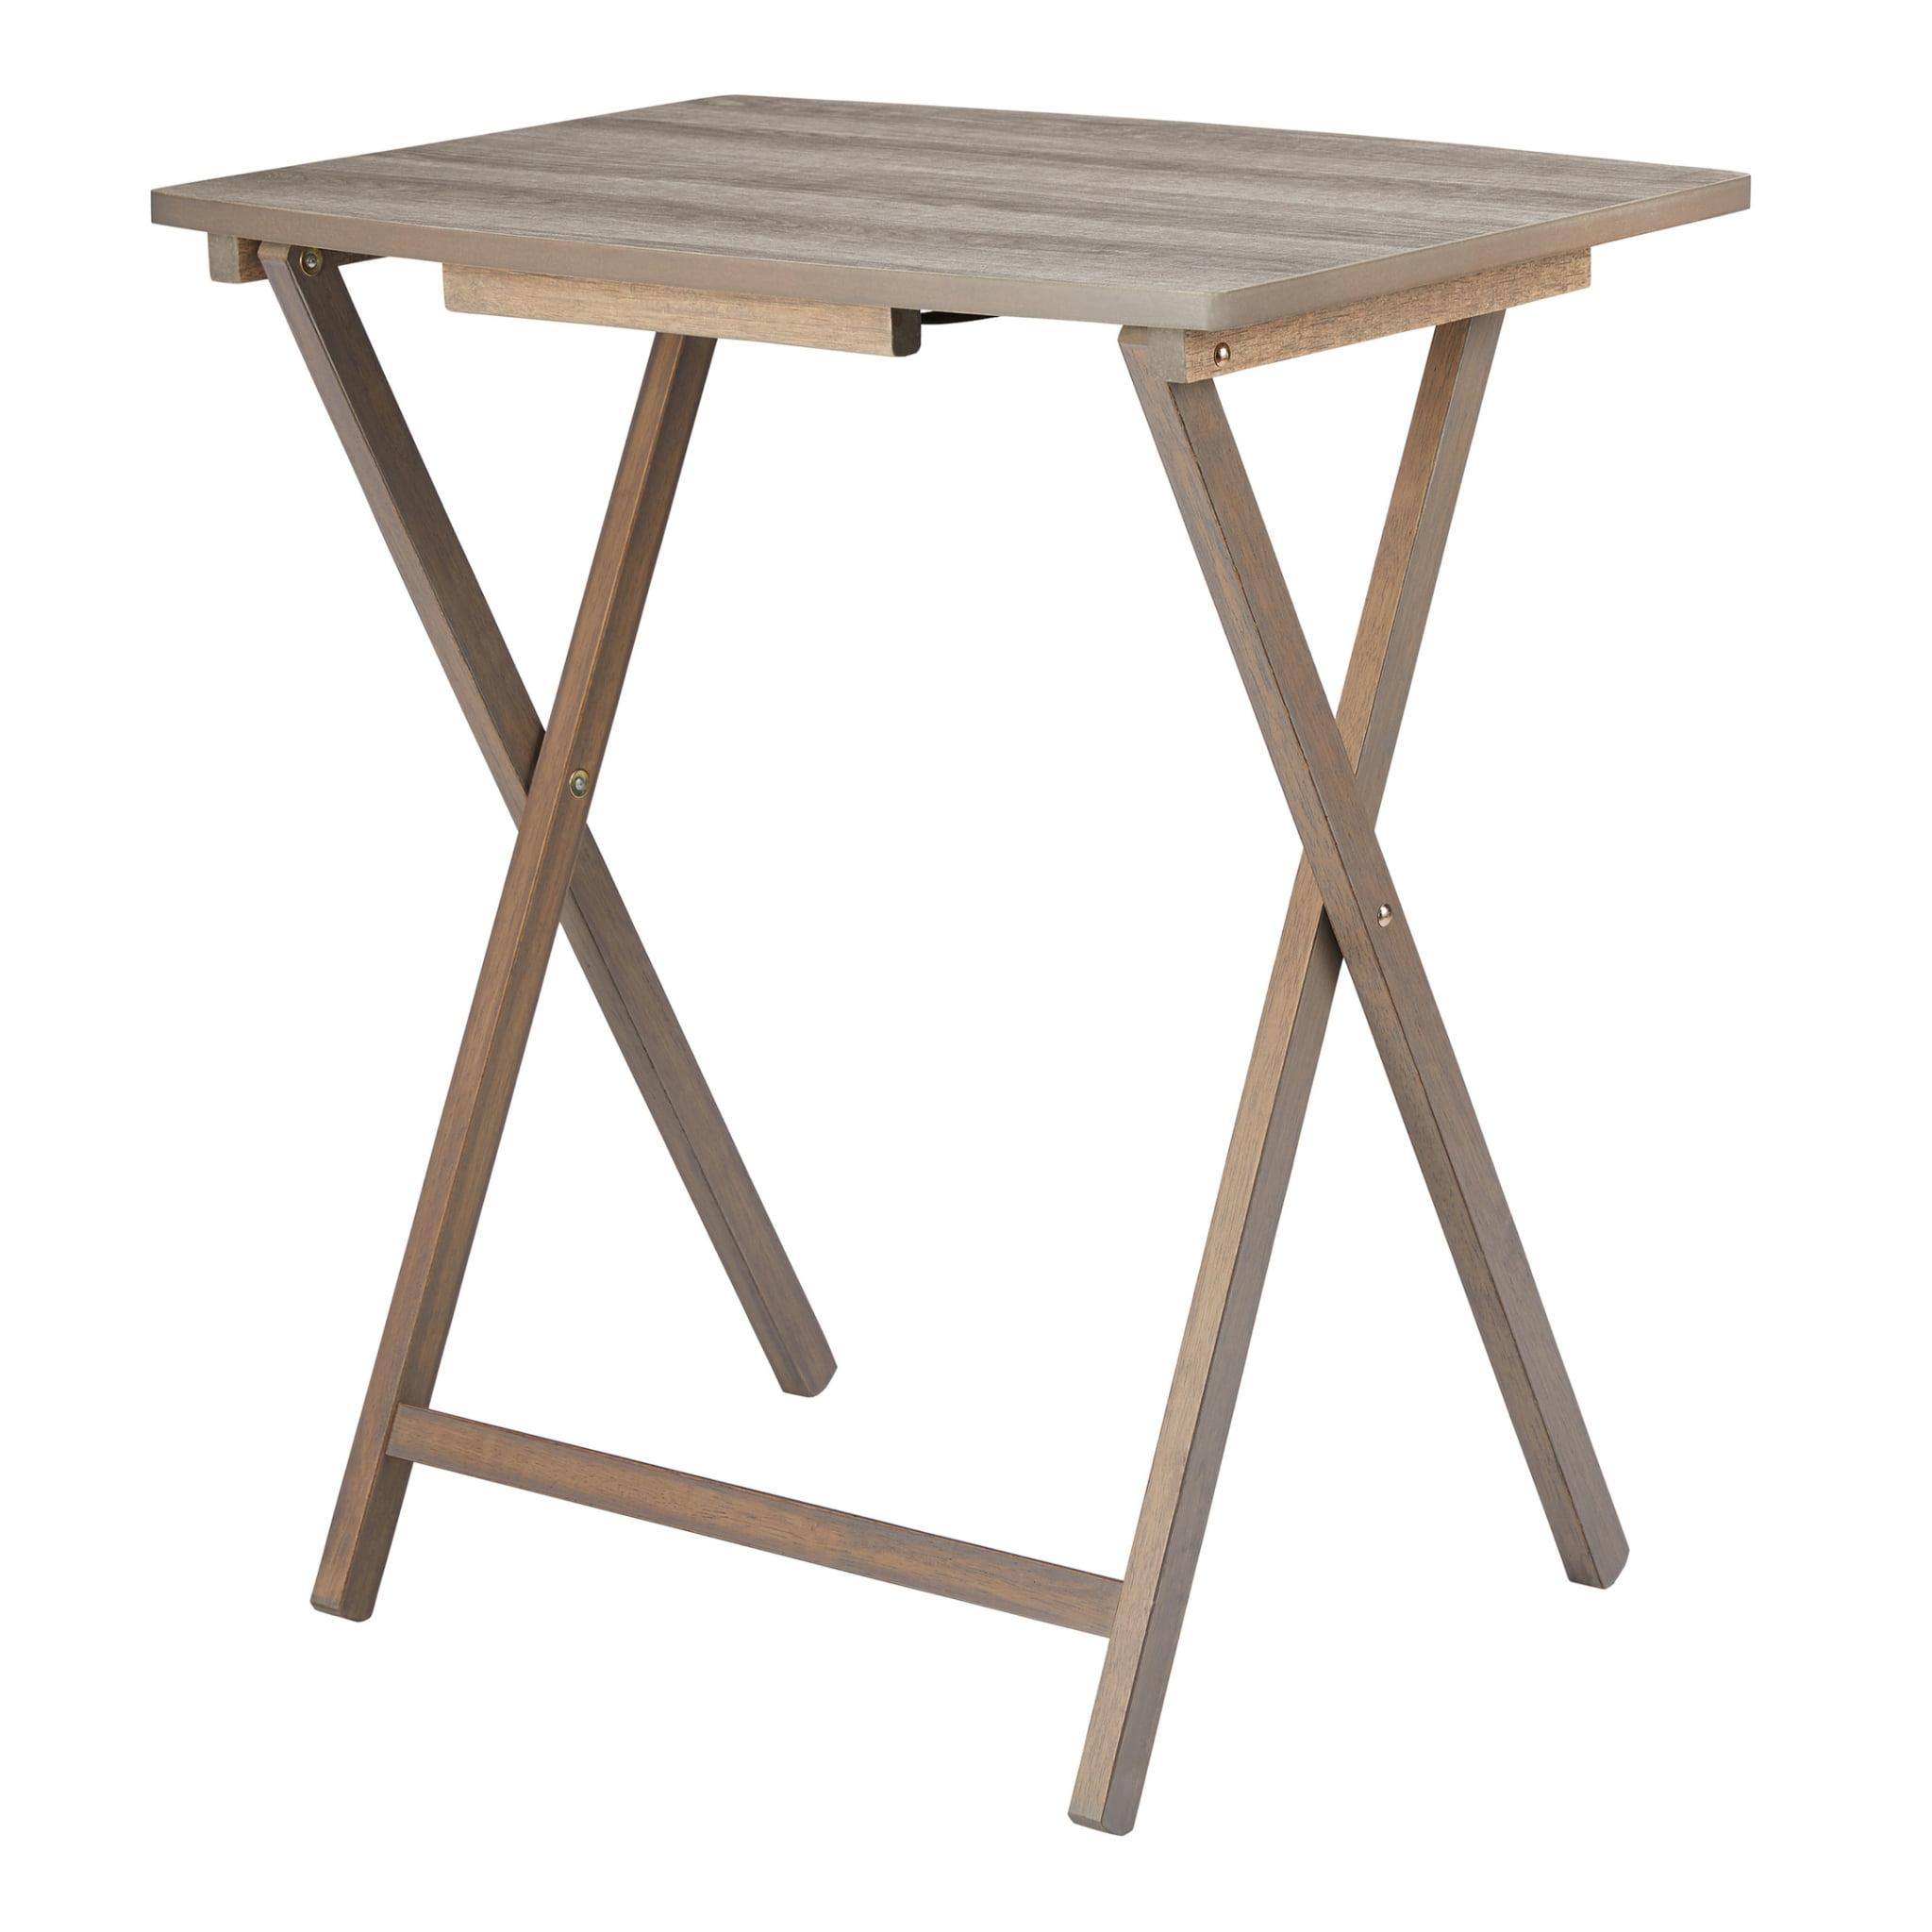 Mainstays Folding Xl Oversized Tray Table Rustic Gray Walmart Com Walmart Com